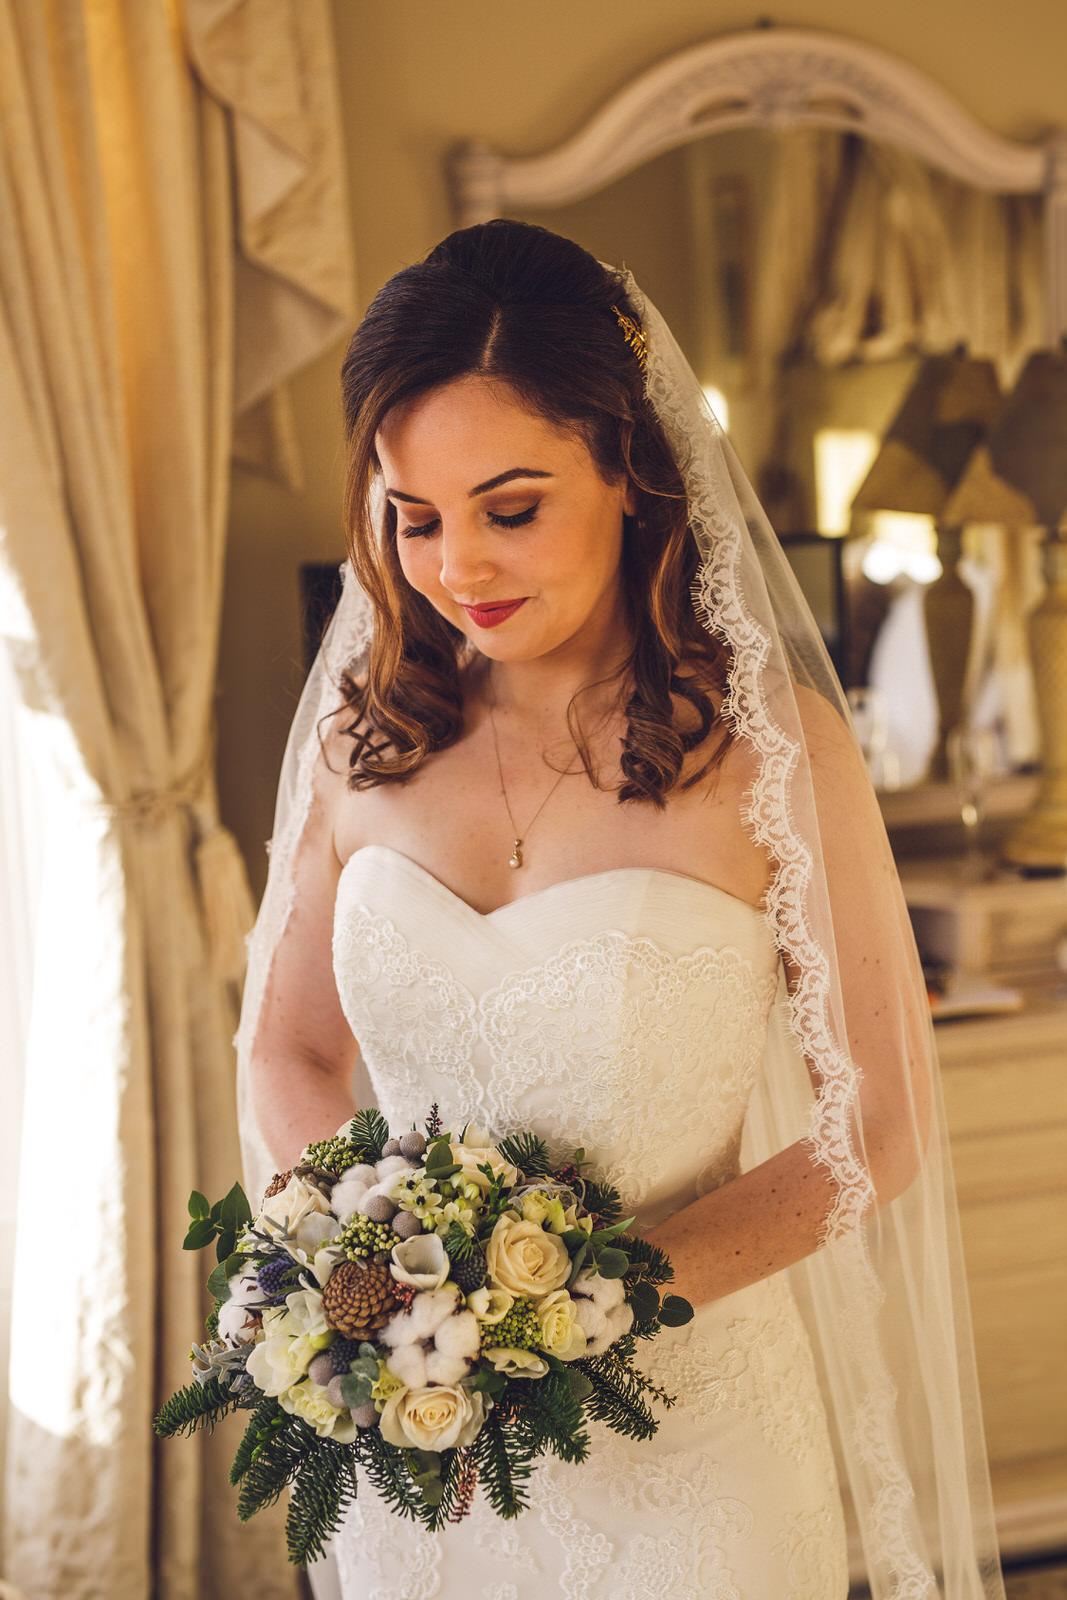 Roger-kenny-wedding-photographer-greystones-wicklow-dublin_026.jpg